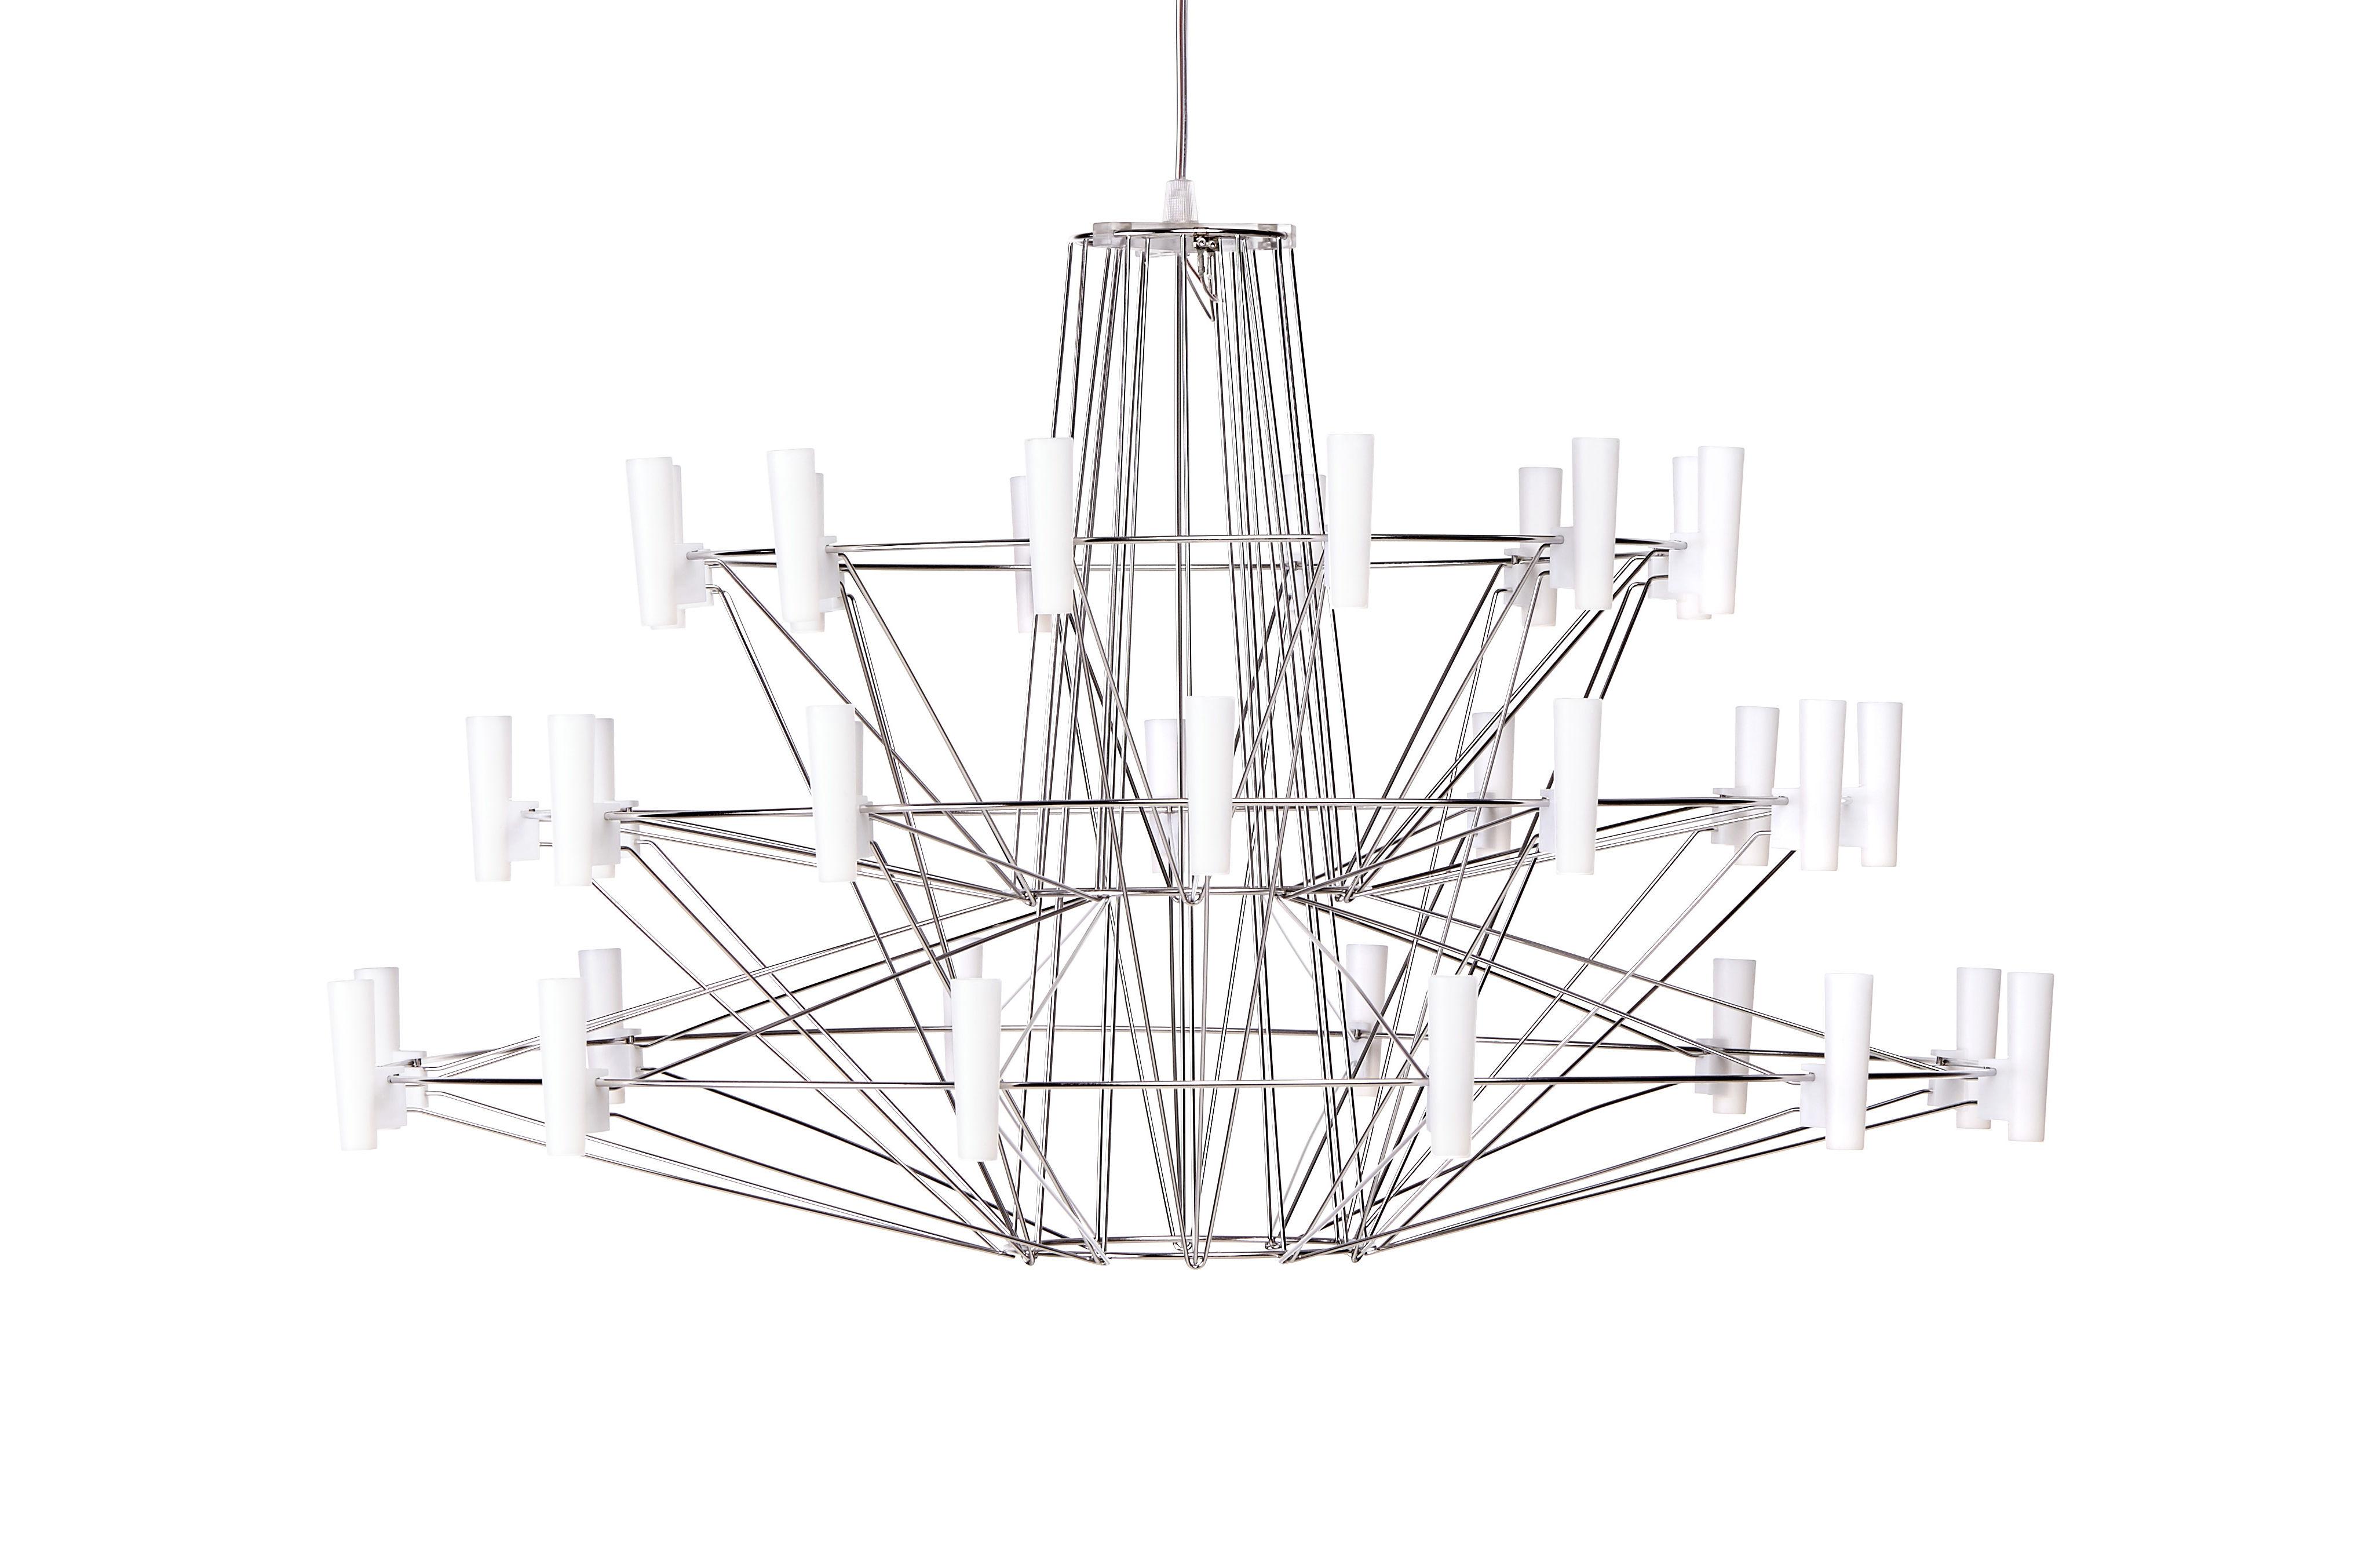 Illuminazione - Lampadari - Sospensione Coppélia - / LED - Ø 68 x H 42 cm di Moooi - Acciaio brillante - Acciaio inossidabile, policarbonato